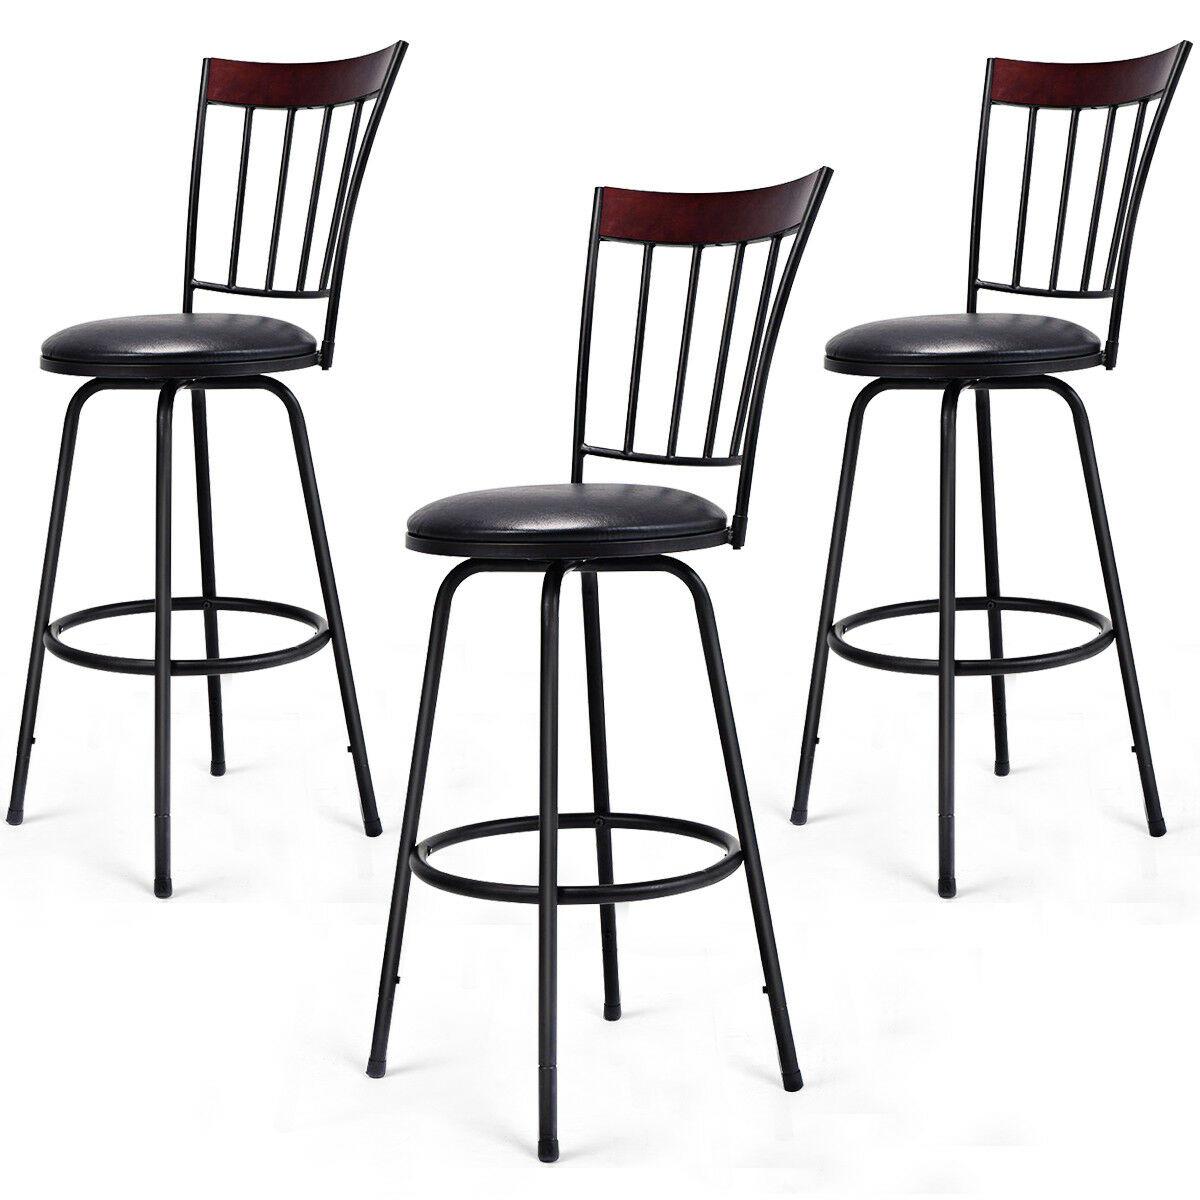 Costway Set Of 3 Swivel Bar Stools PU Leather Steel Frame Barstool Bistro Pub Chair